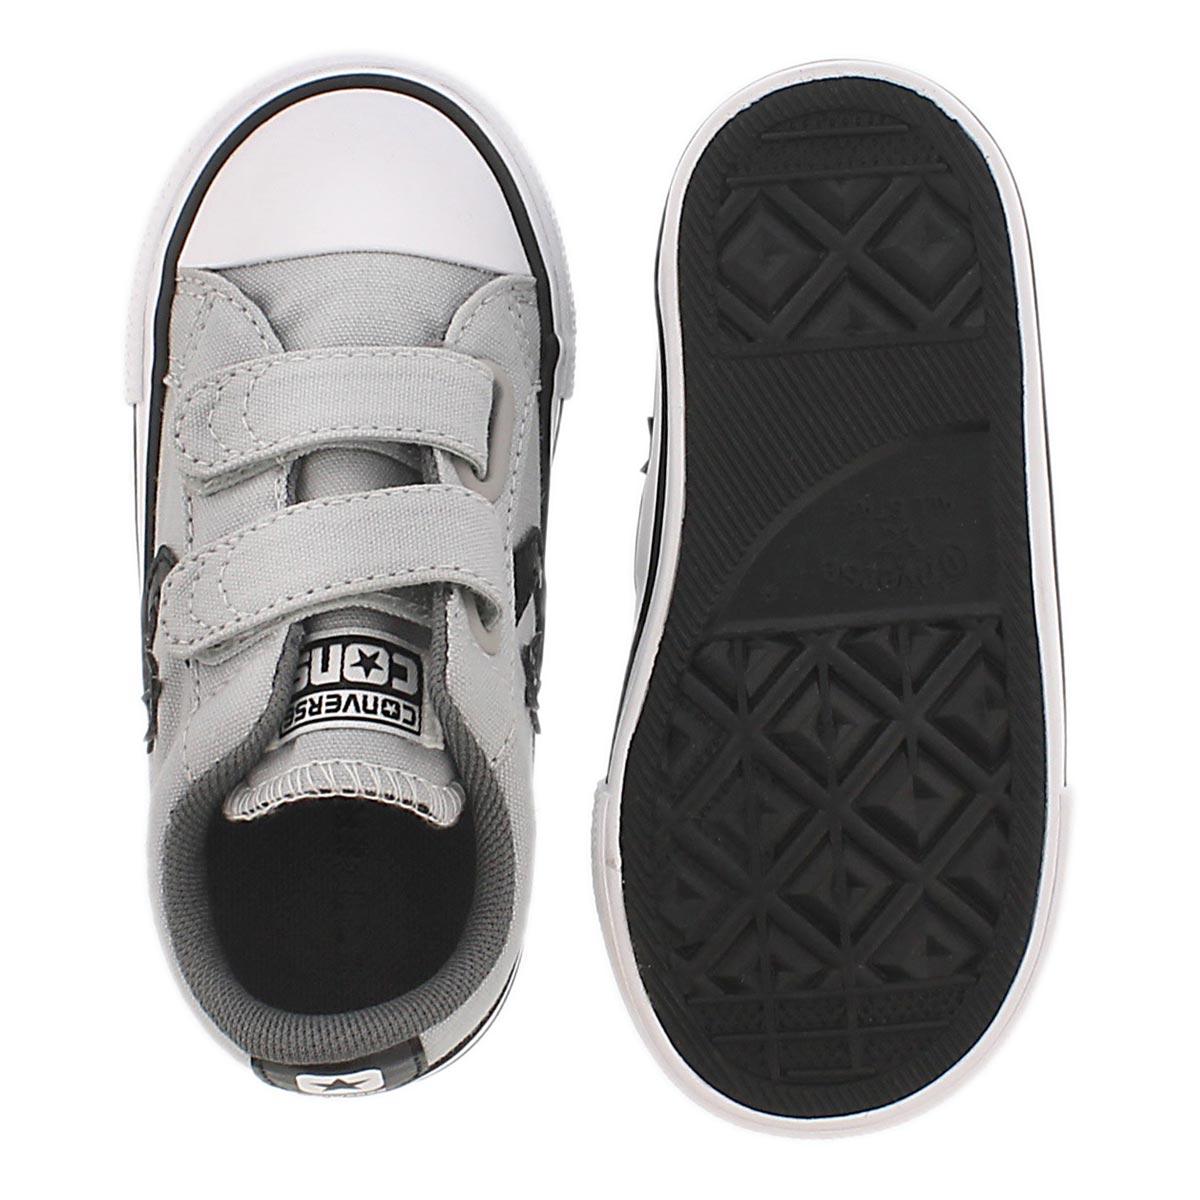 Inf CT Star Player EV V2 gry/blk sneaker